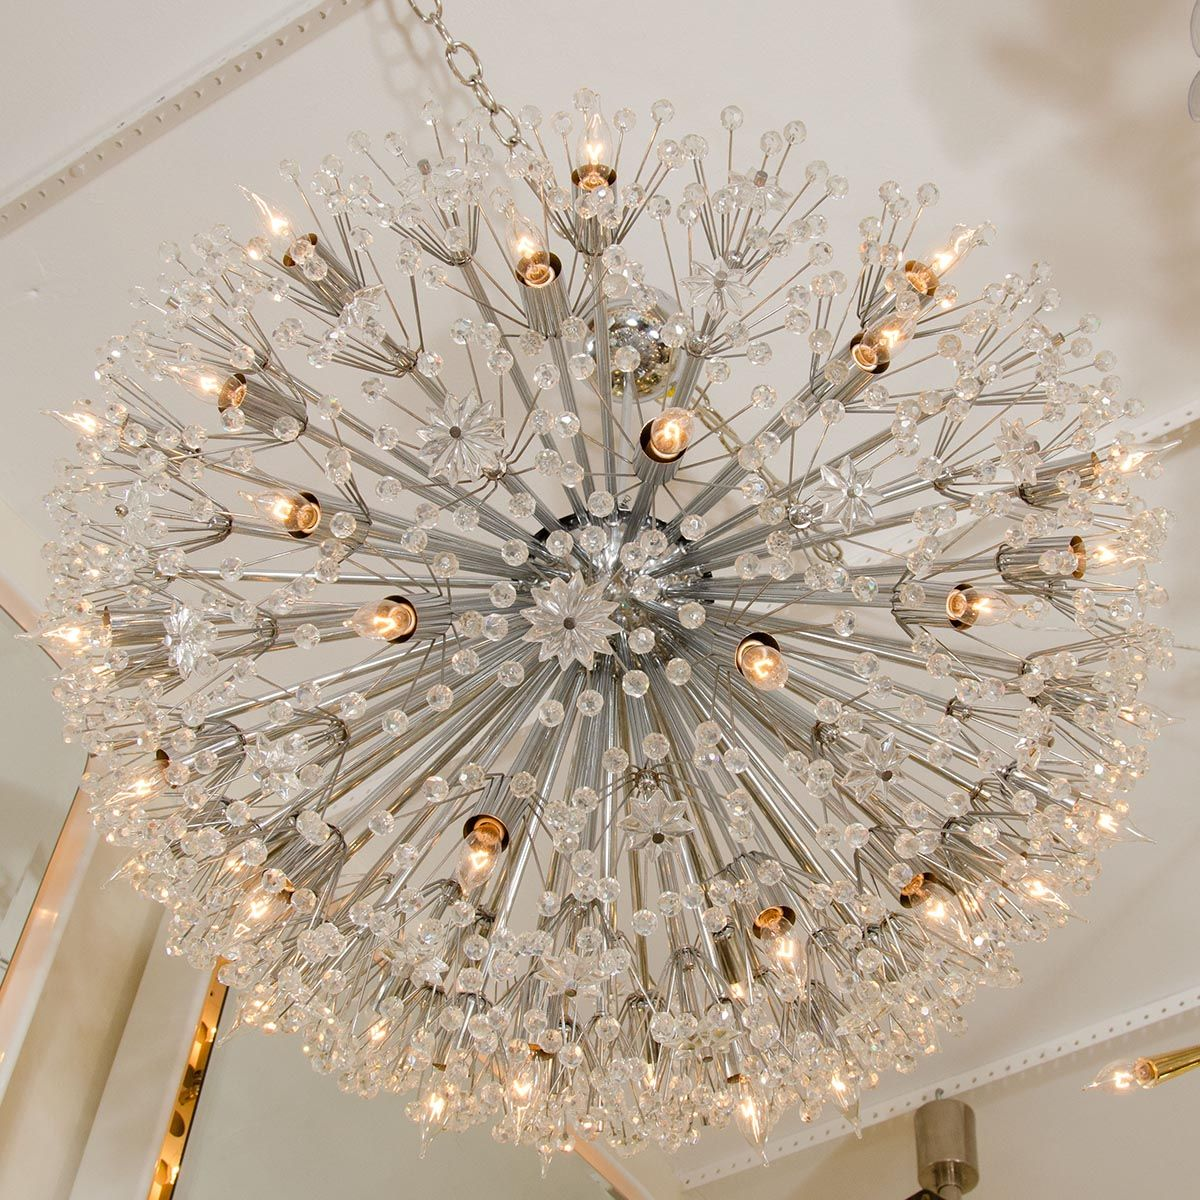 Exceptional Monumental Polished Nickel Half Starburst Chandelier | Chandeliers U0026  Pendants | John Salibello